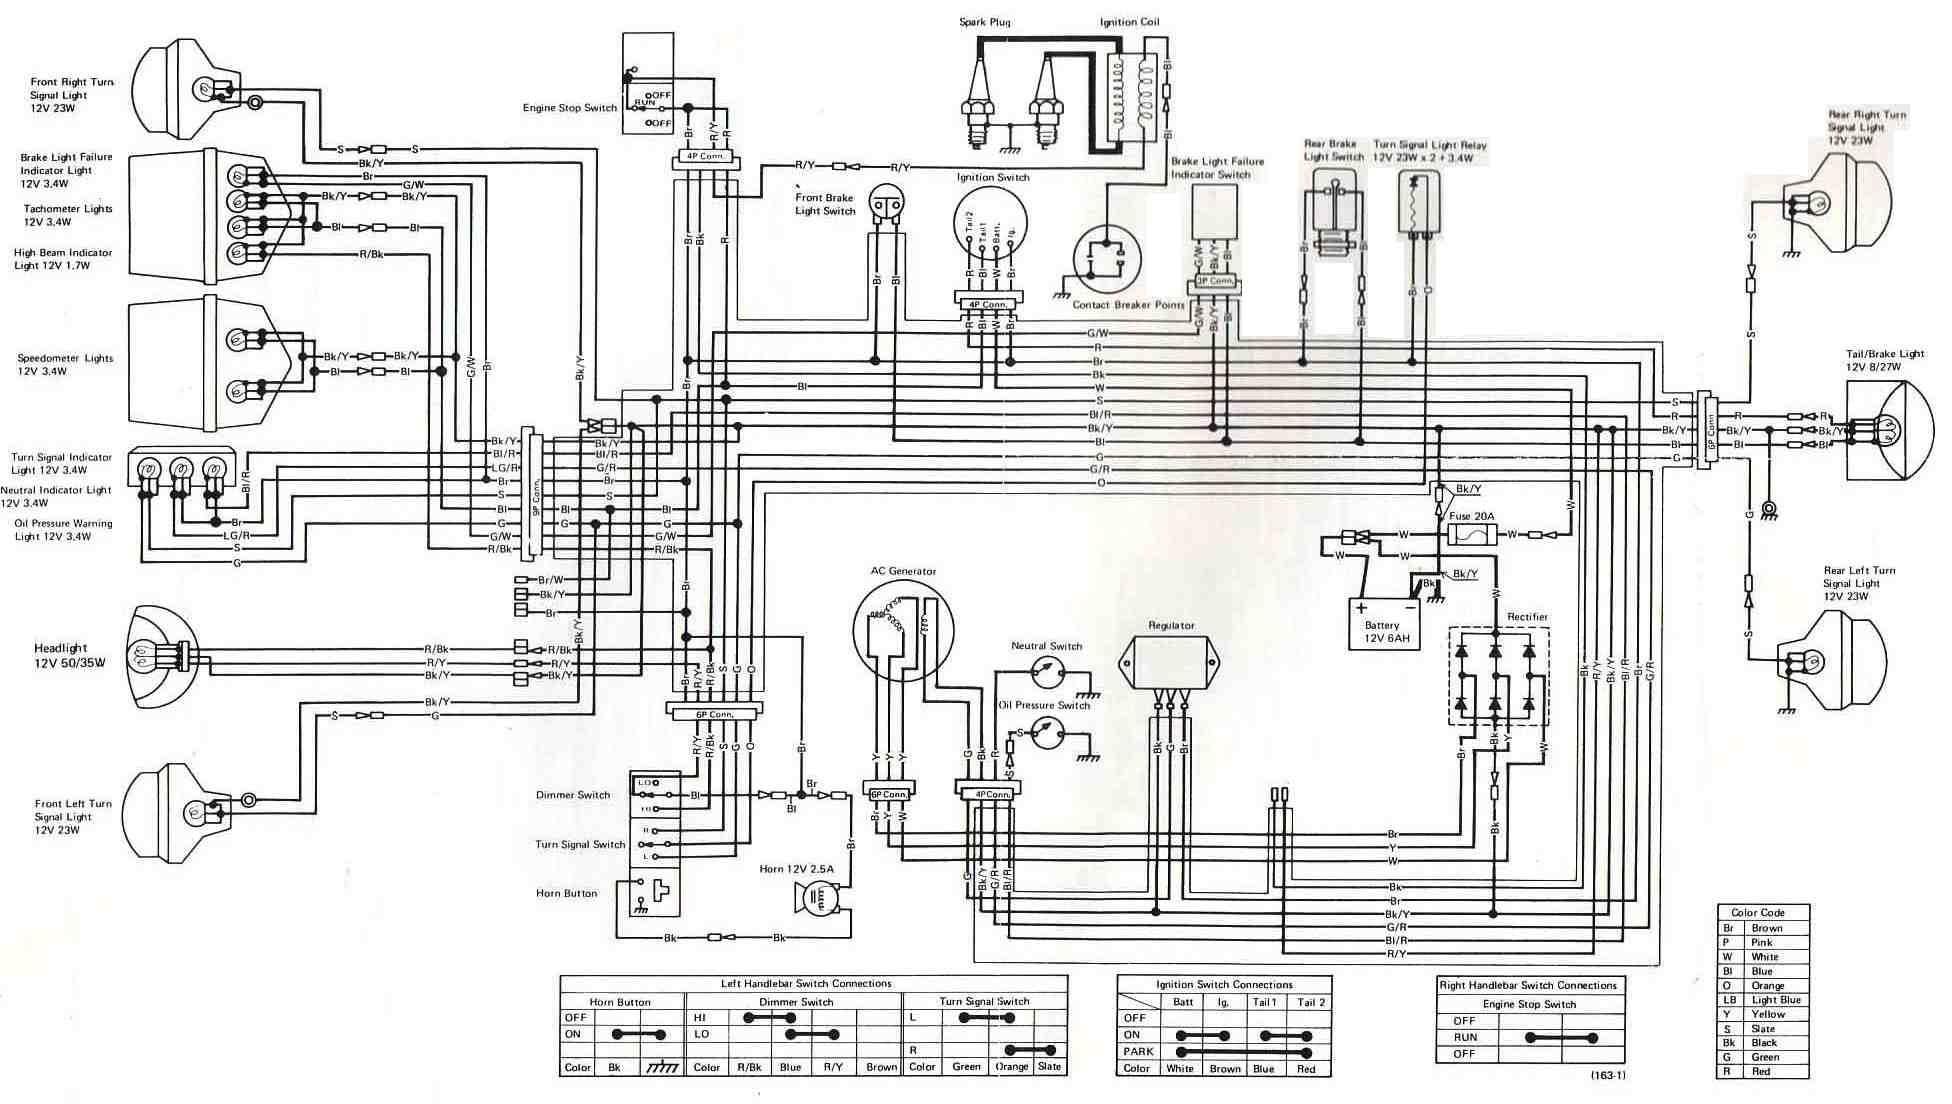 Kawasaki Zxi 750 Wiring Diagram